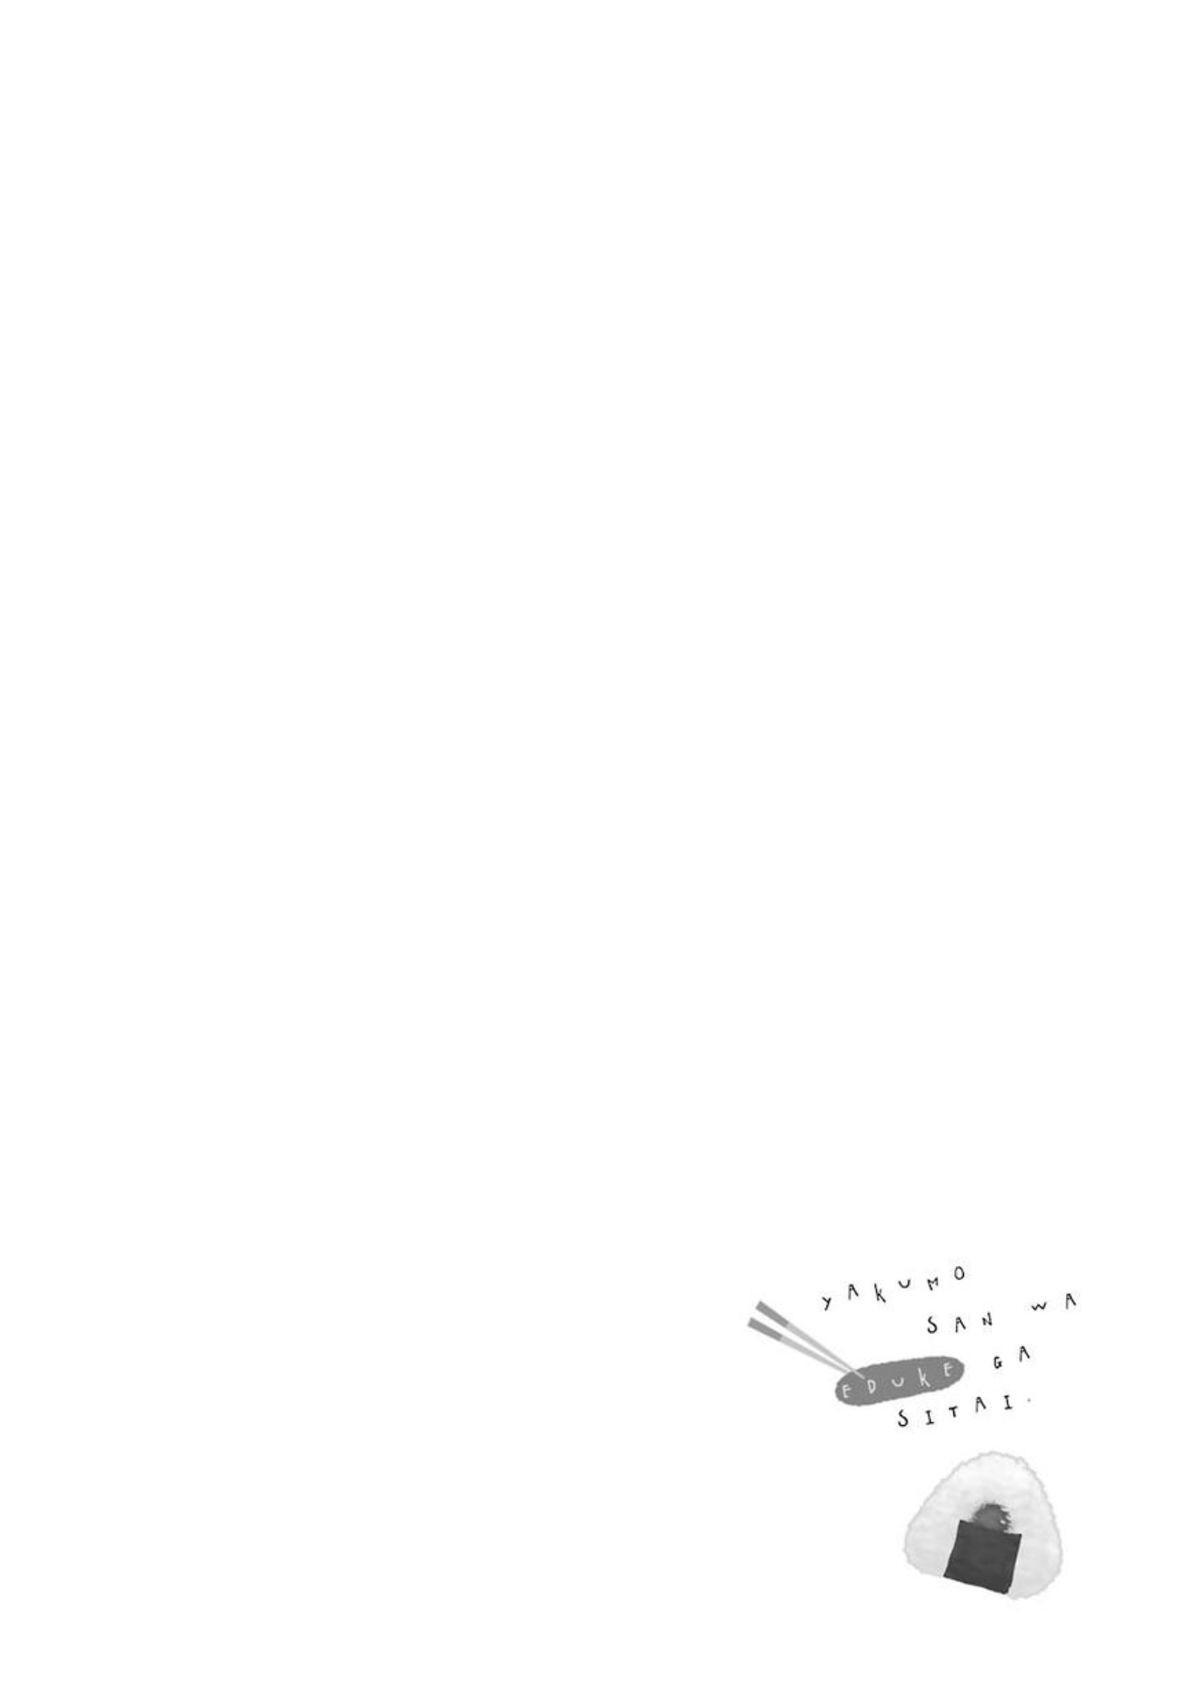 Yakumo-san wa Edzuke ga Shitai Chp 10. join list: WholesomeFoodManga (40 subs)Mention History.. (9000 hours in ms paint) wholesome Food manga